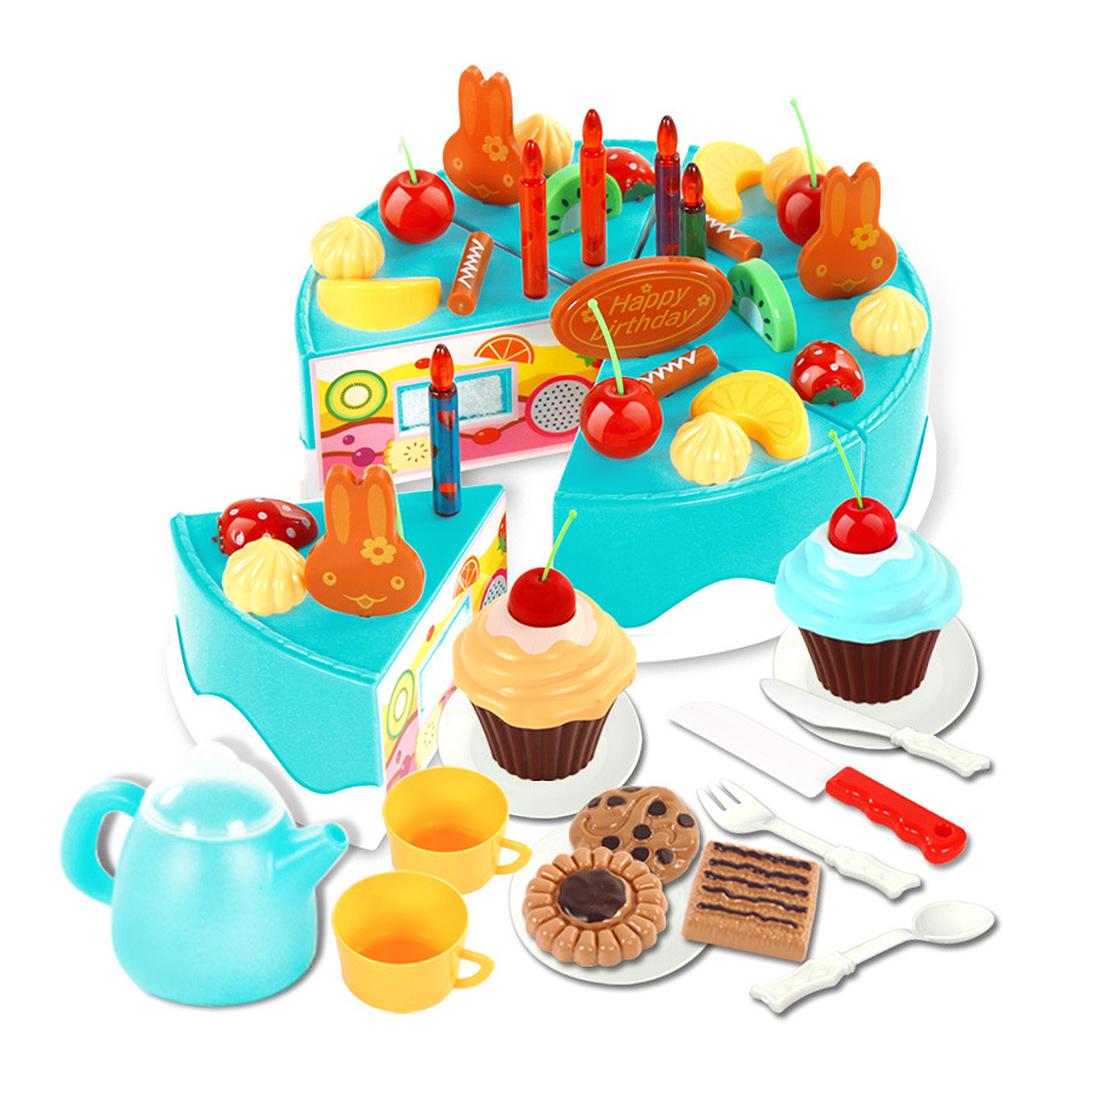 54pcs Plastic Kitchen Cutting Toy Birthday Cake Pretend